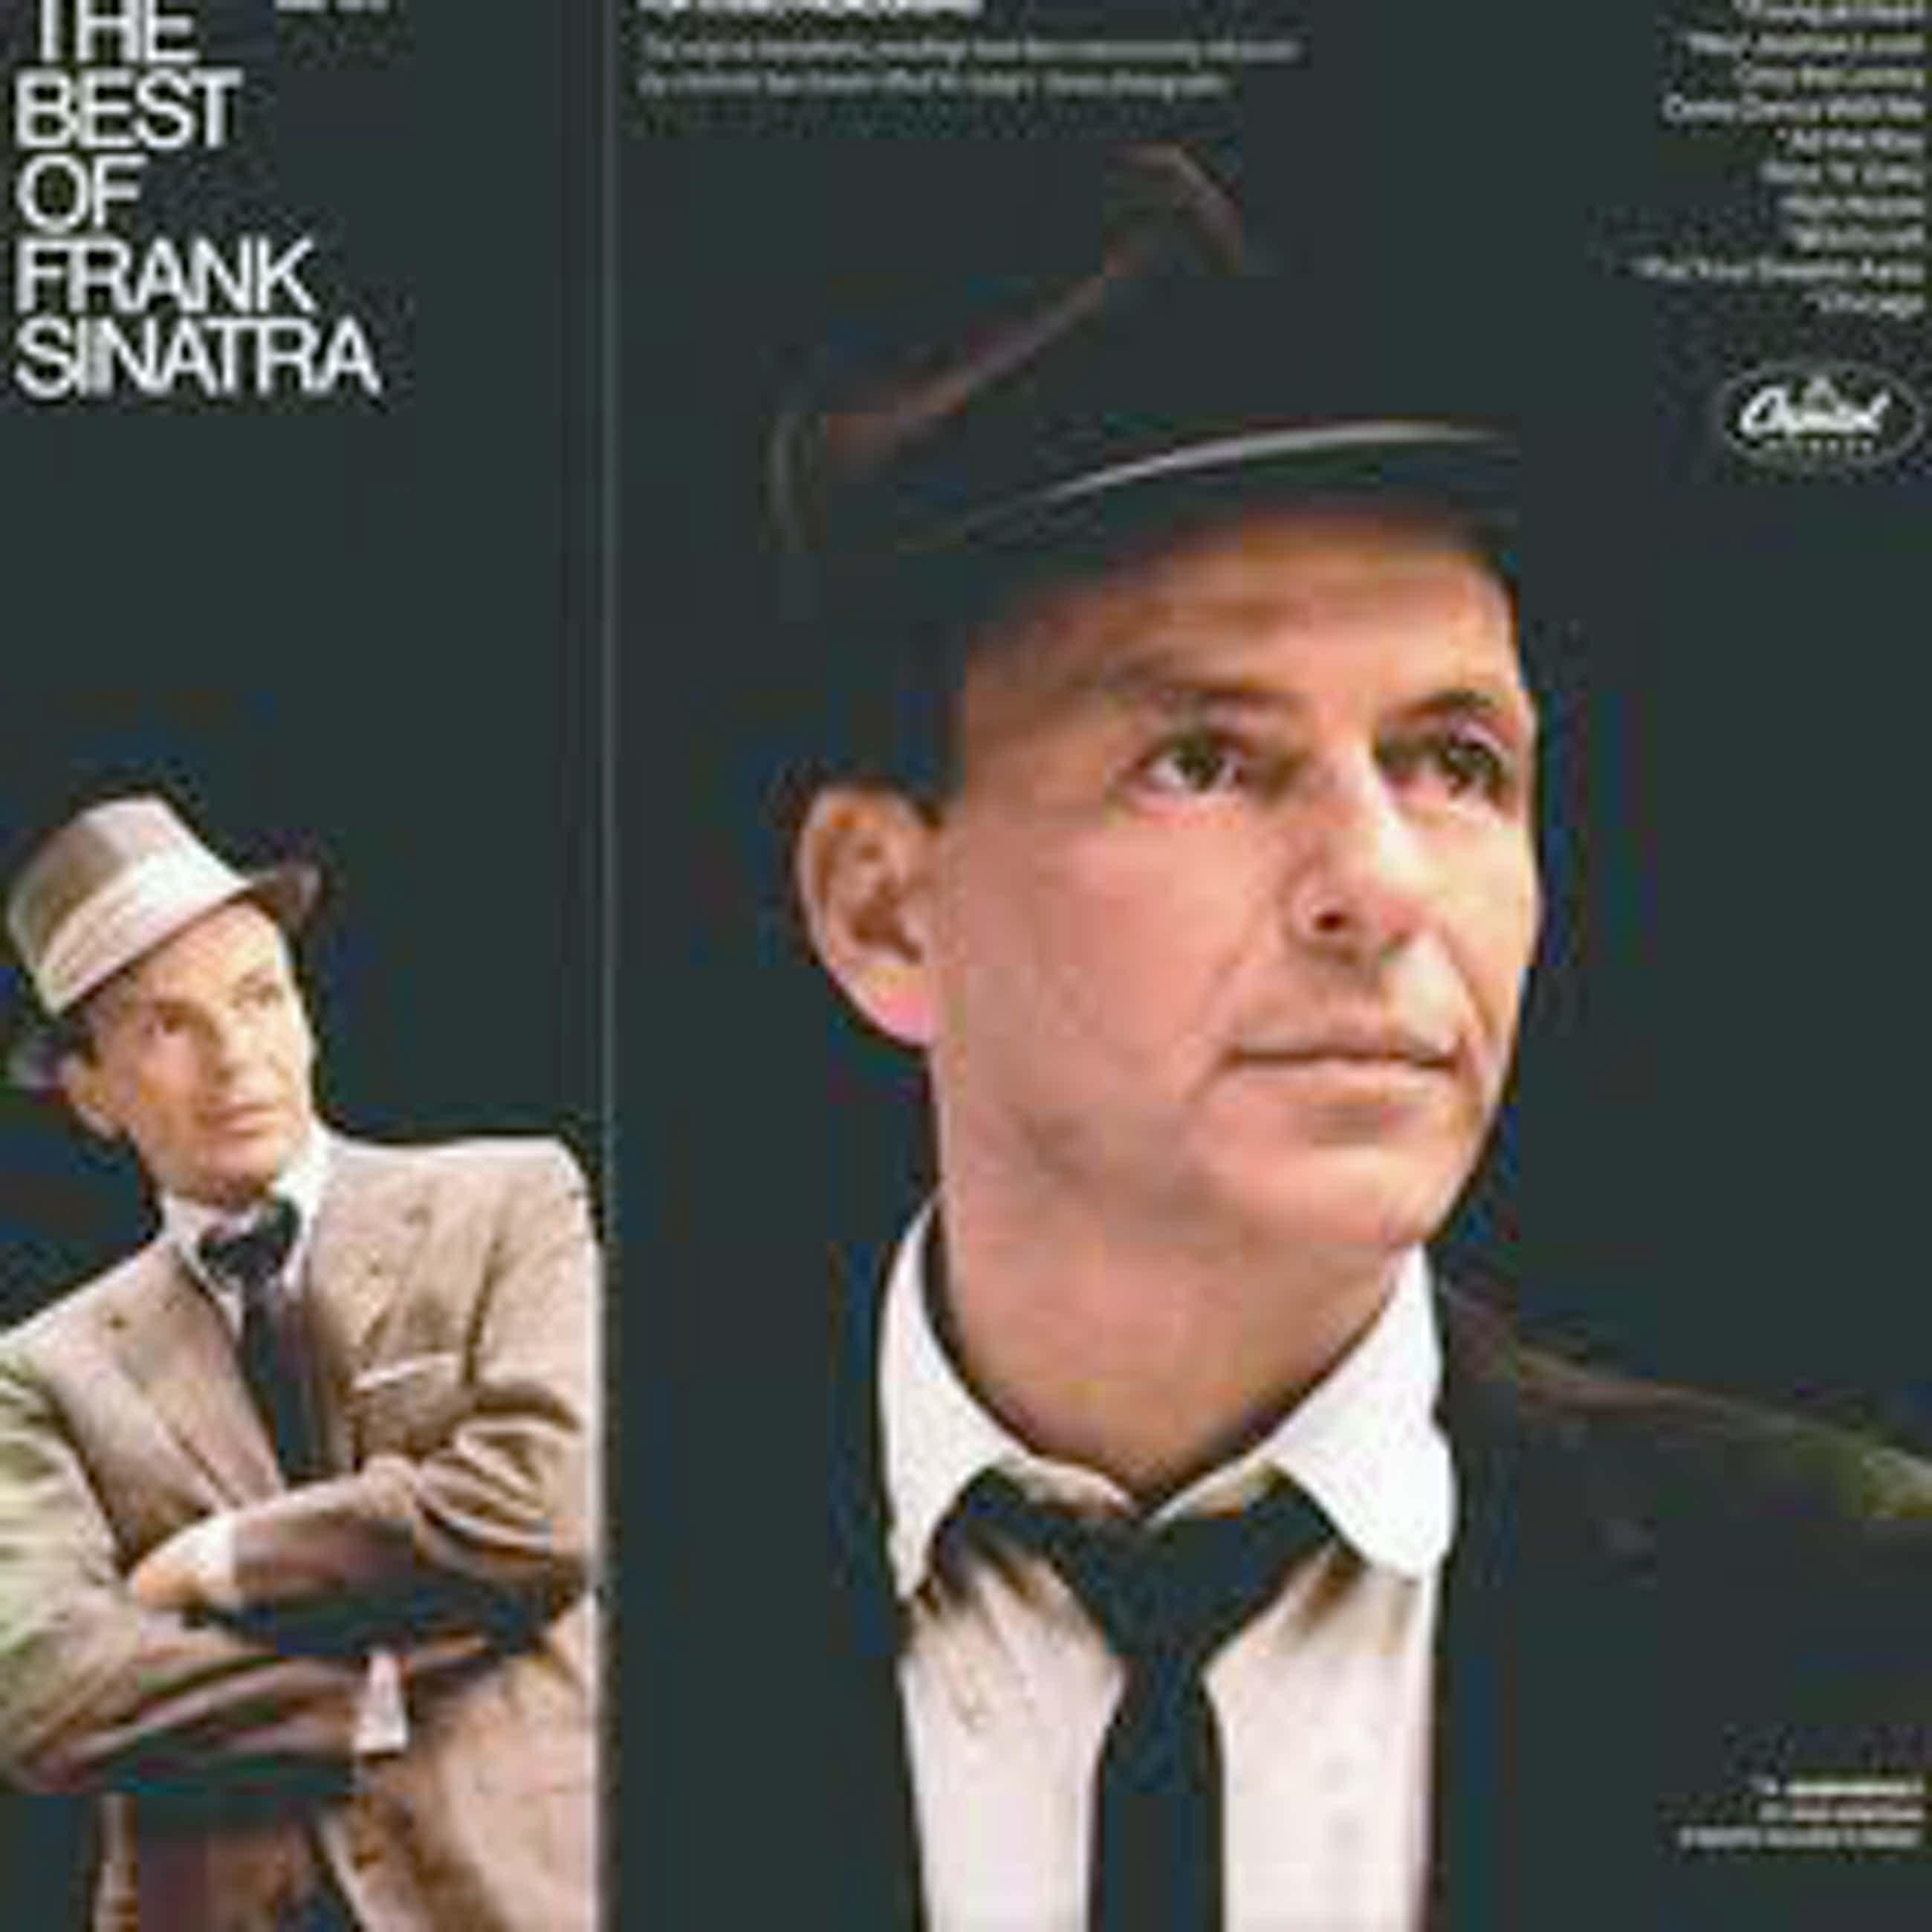 Frank Sinatra - The best of Frank Sinatra kopen? Bied vanaf 1!